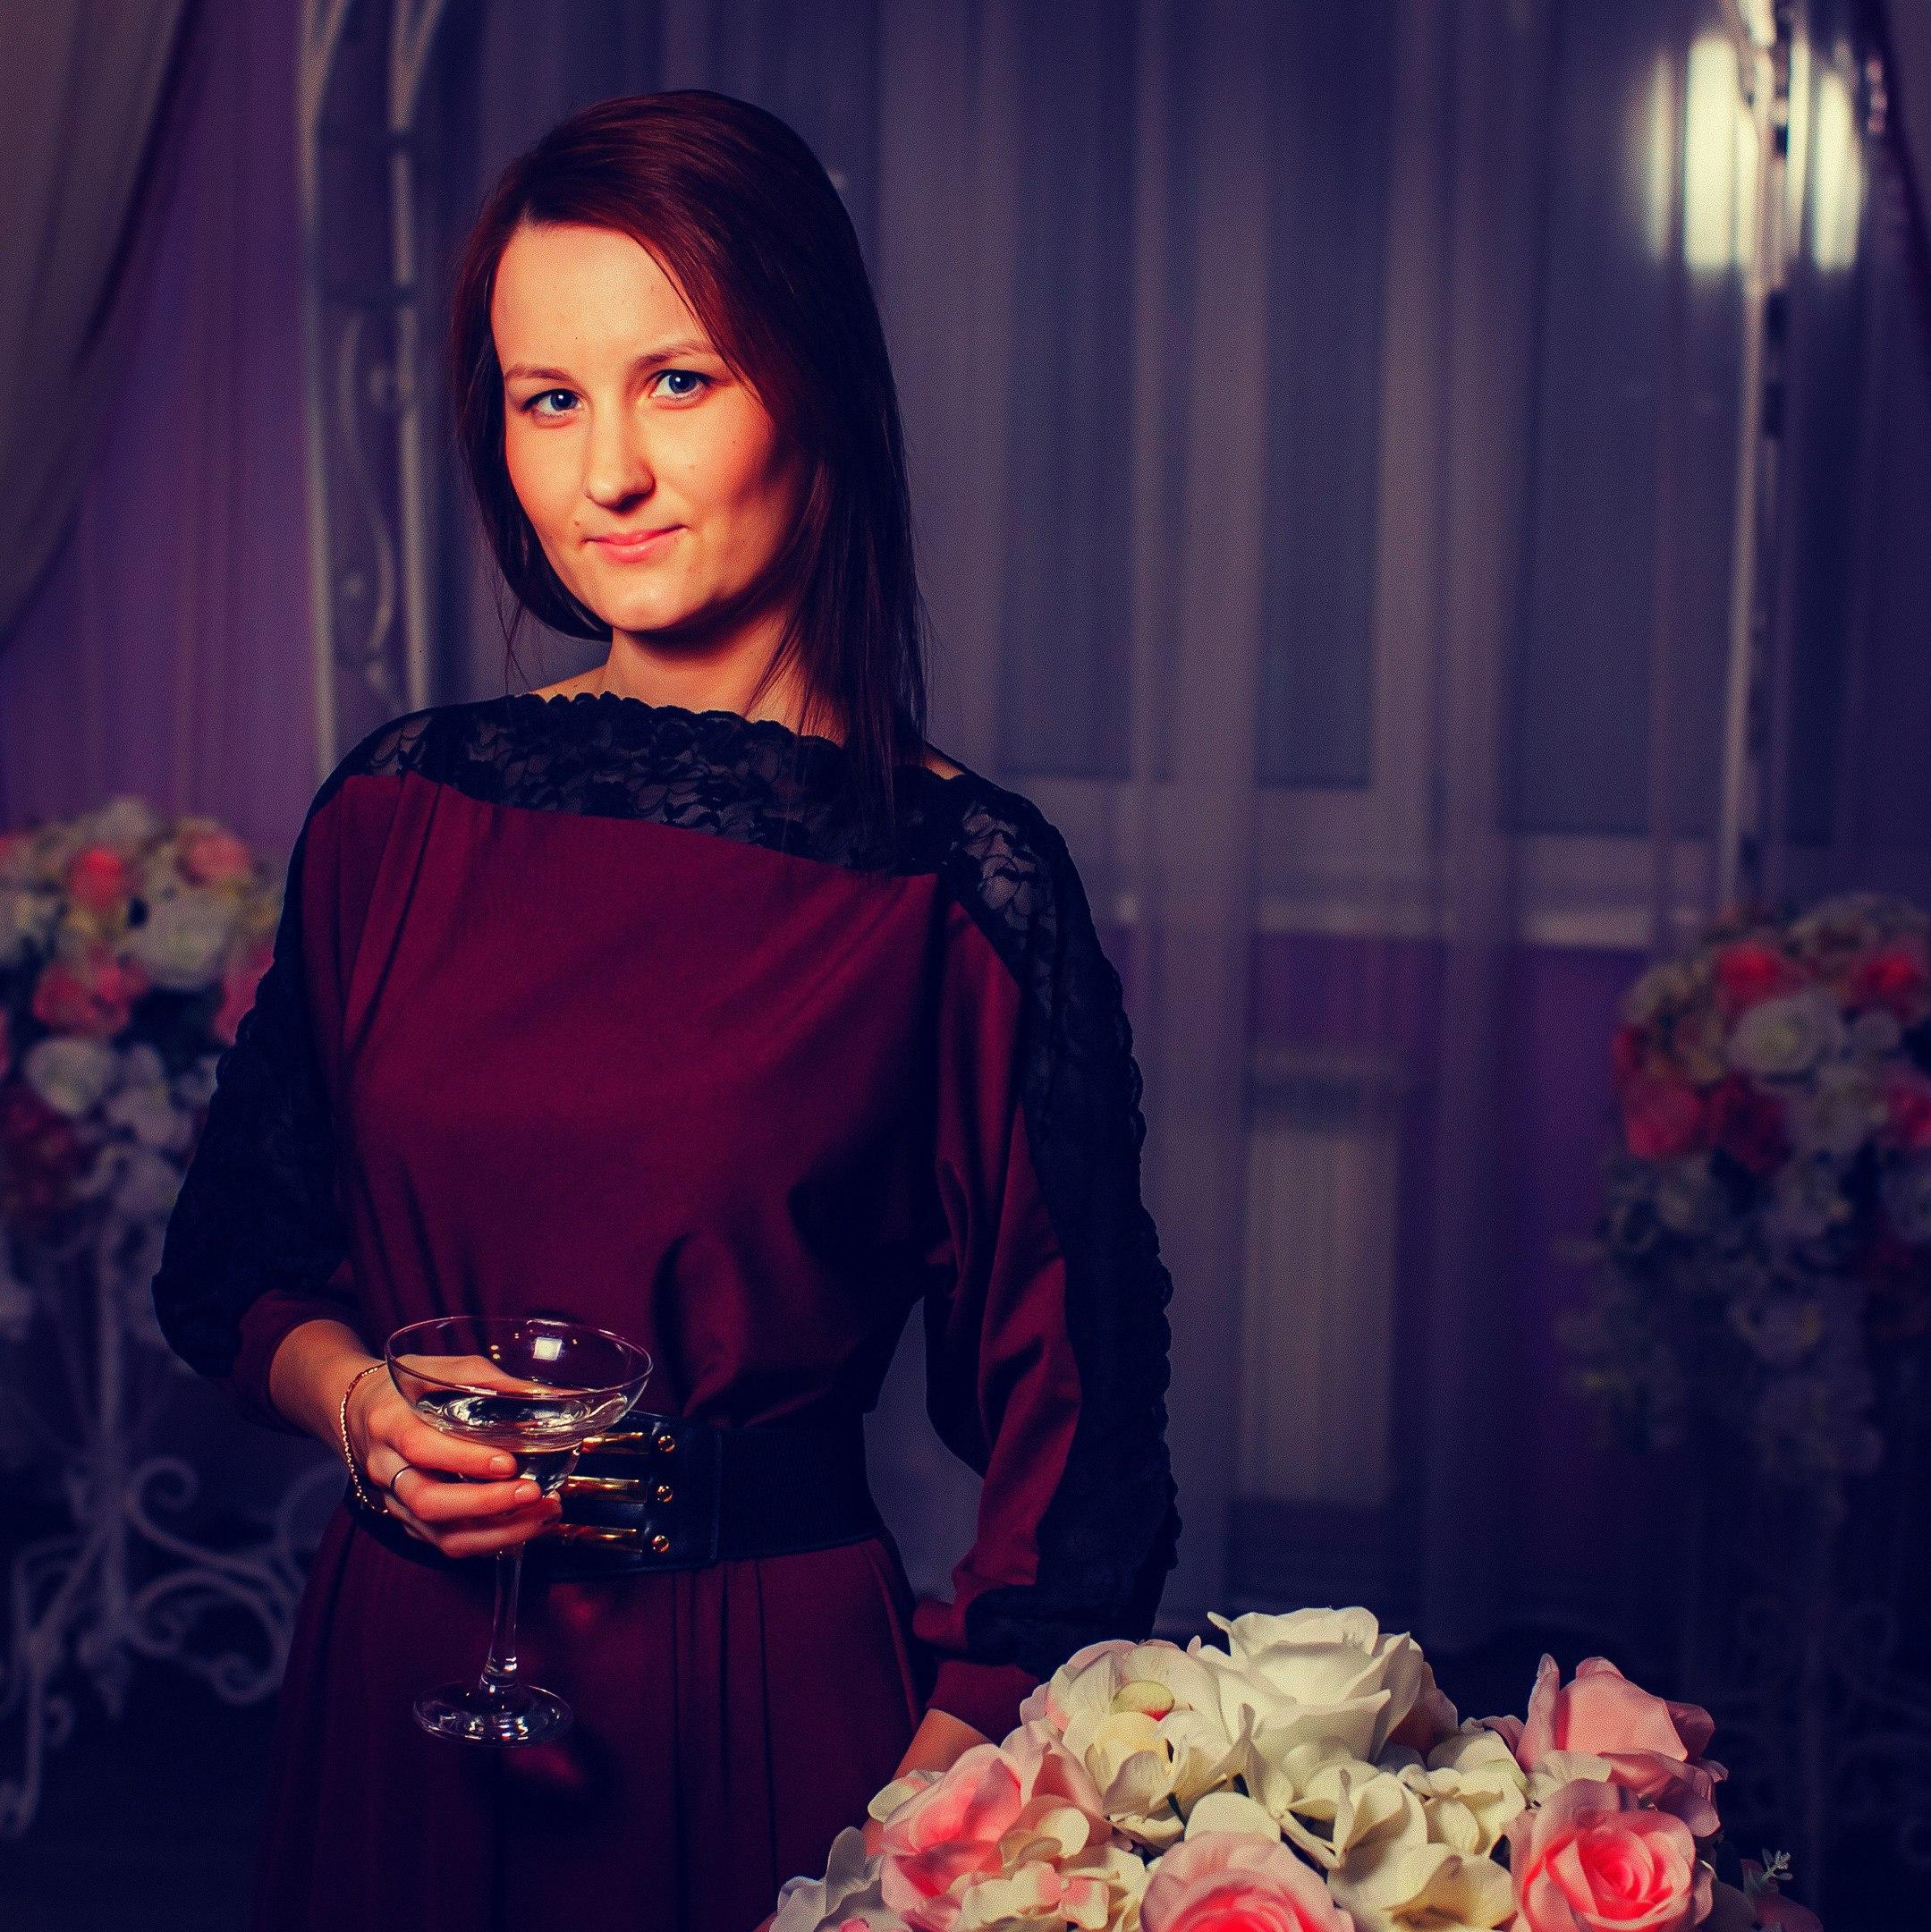 Ольга Дмитриева (Olga Dmitrieva)